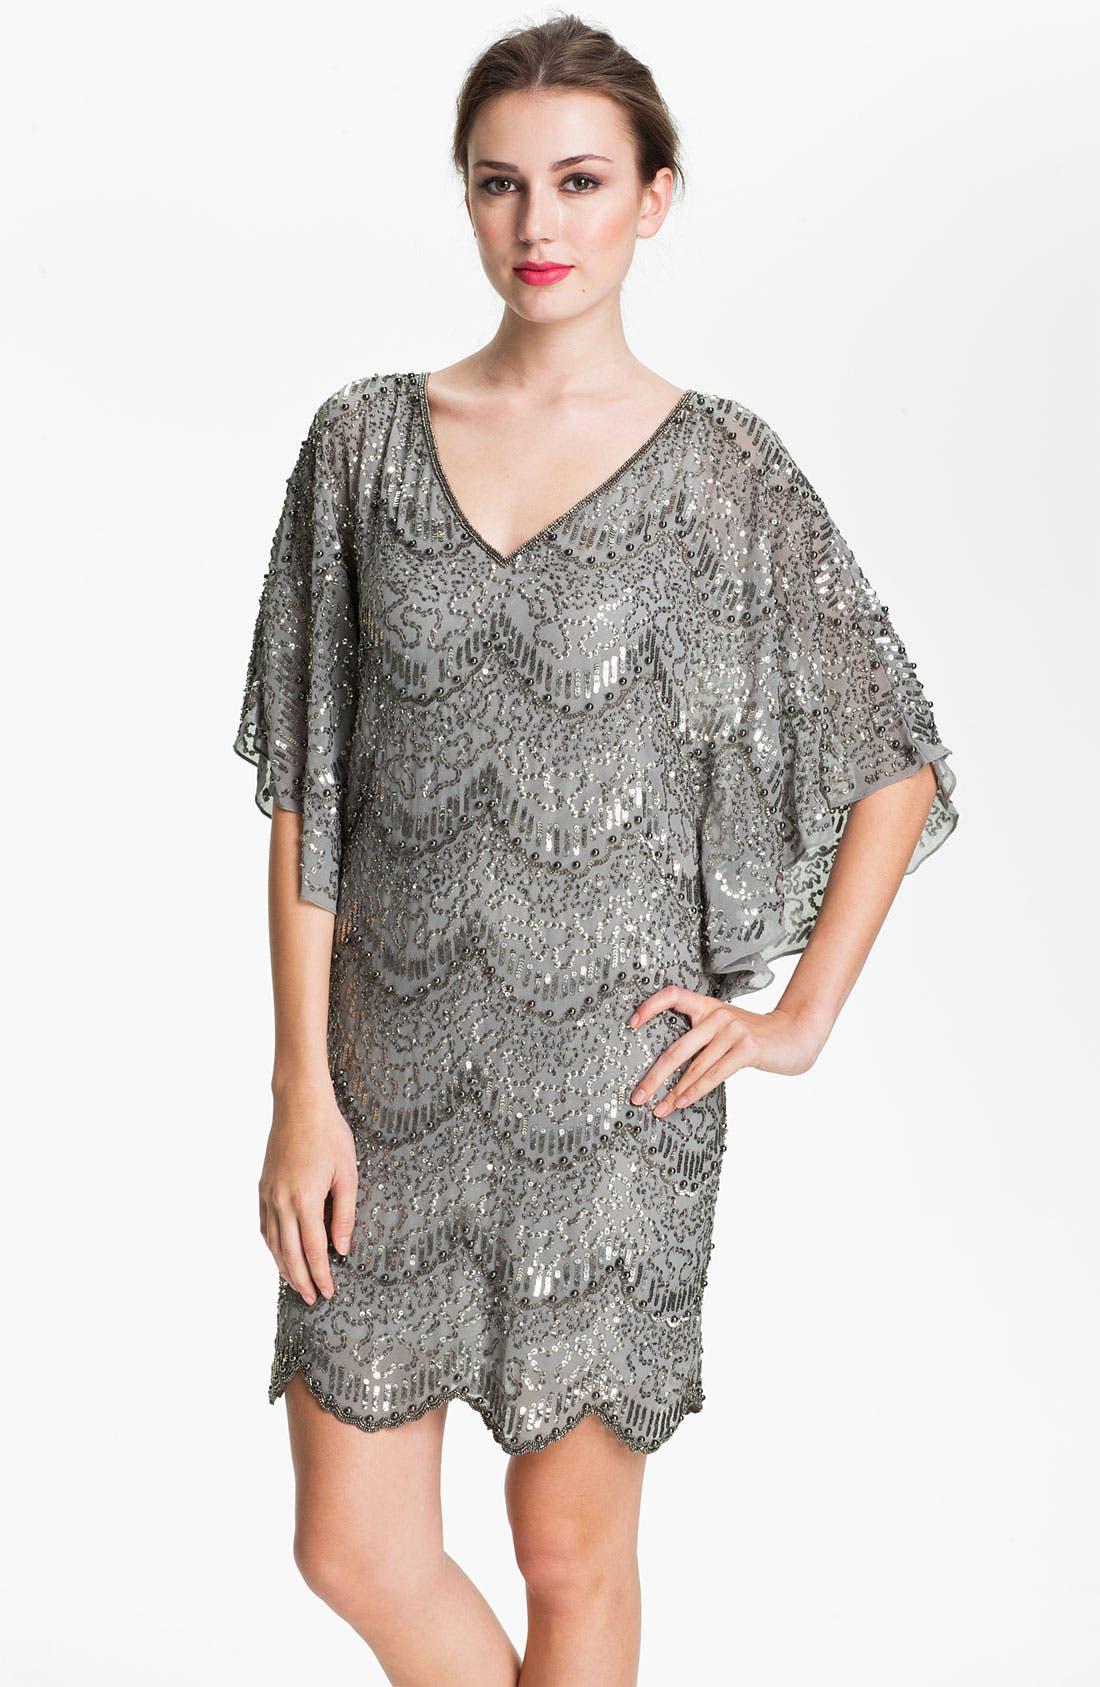 Alternate Image 1 Selected - Adrianna Papell Flutter Sleeve Embellished Chiffon Dress